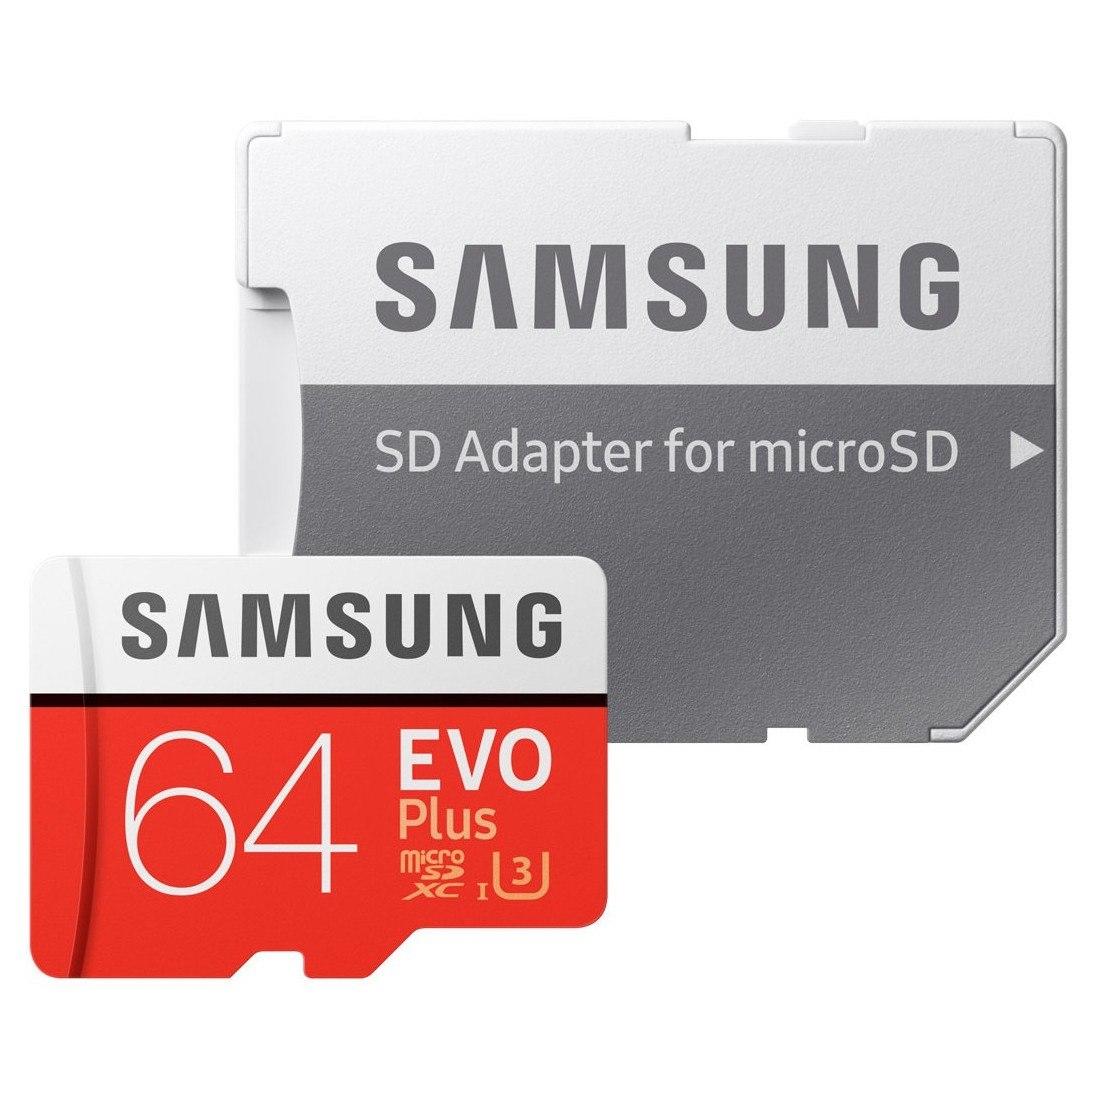 Samsung EVO Plus 64 GB Class 10/UHS-I (U3) microSDXC